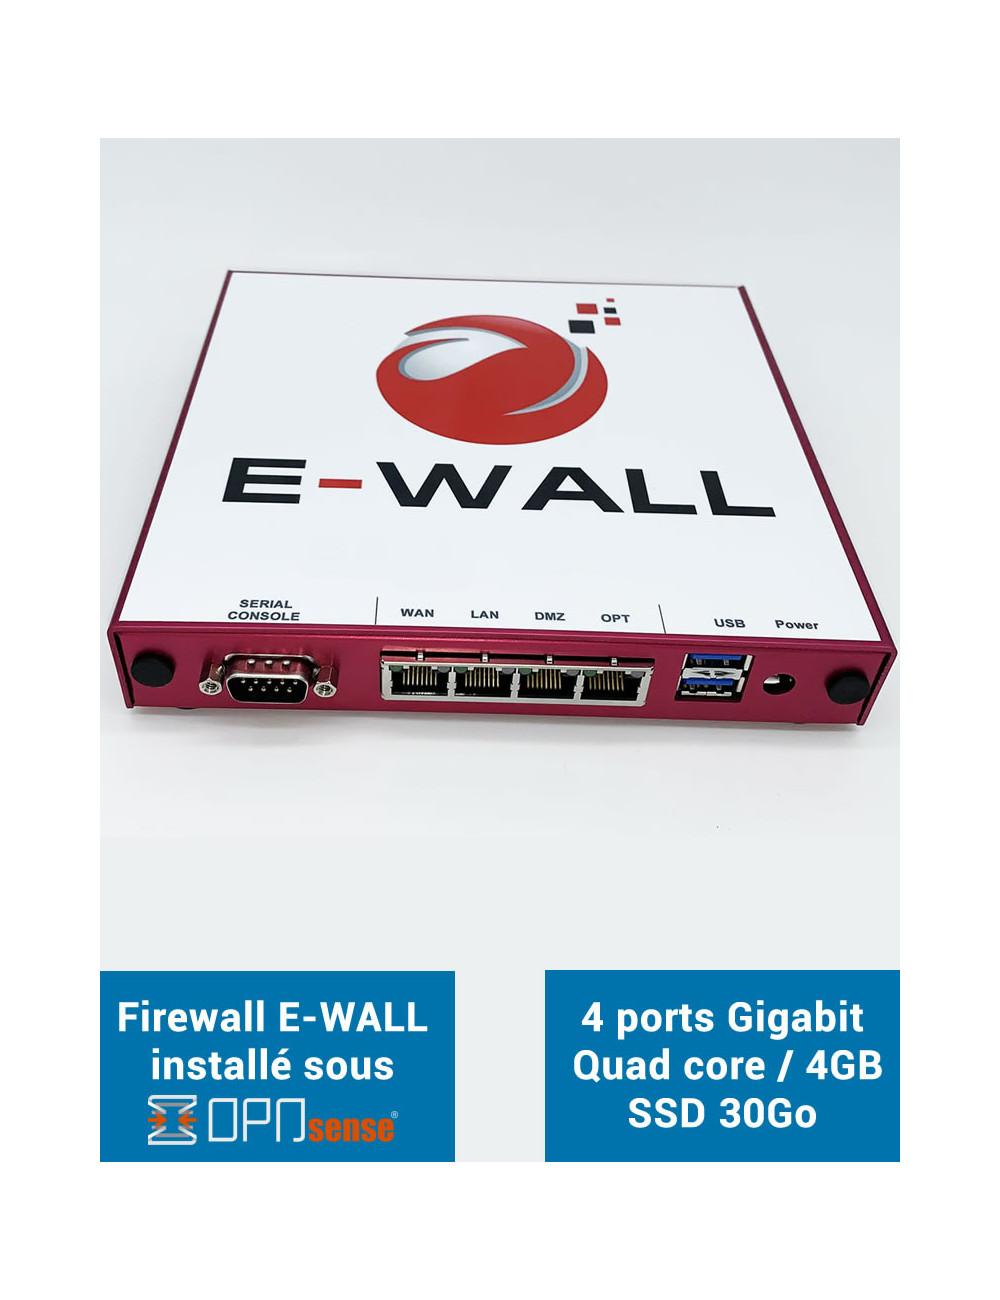 E-WALL SYNOLOGY Server NAS - Backup